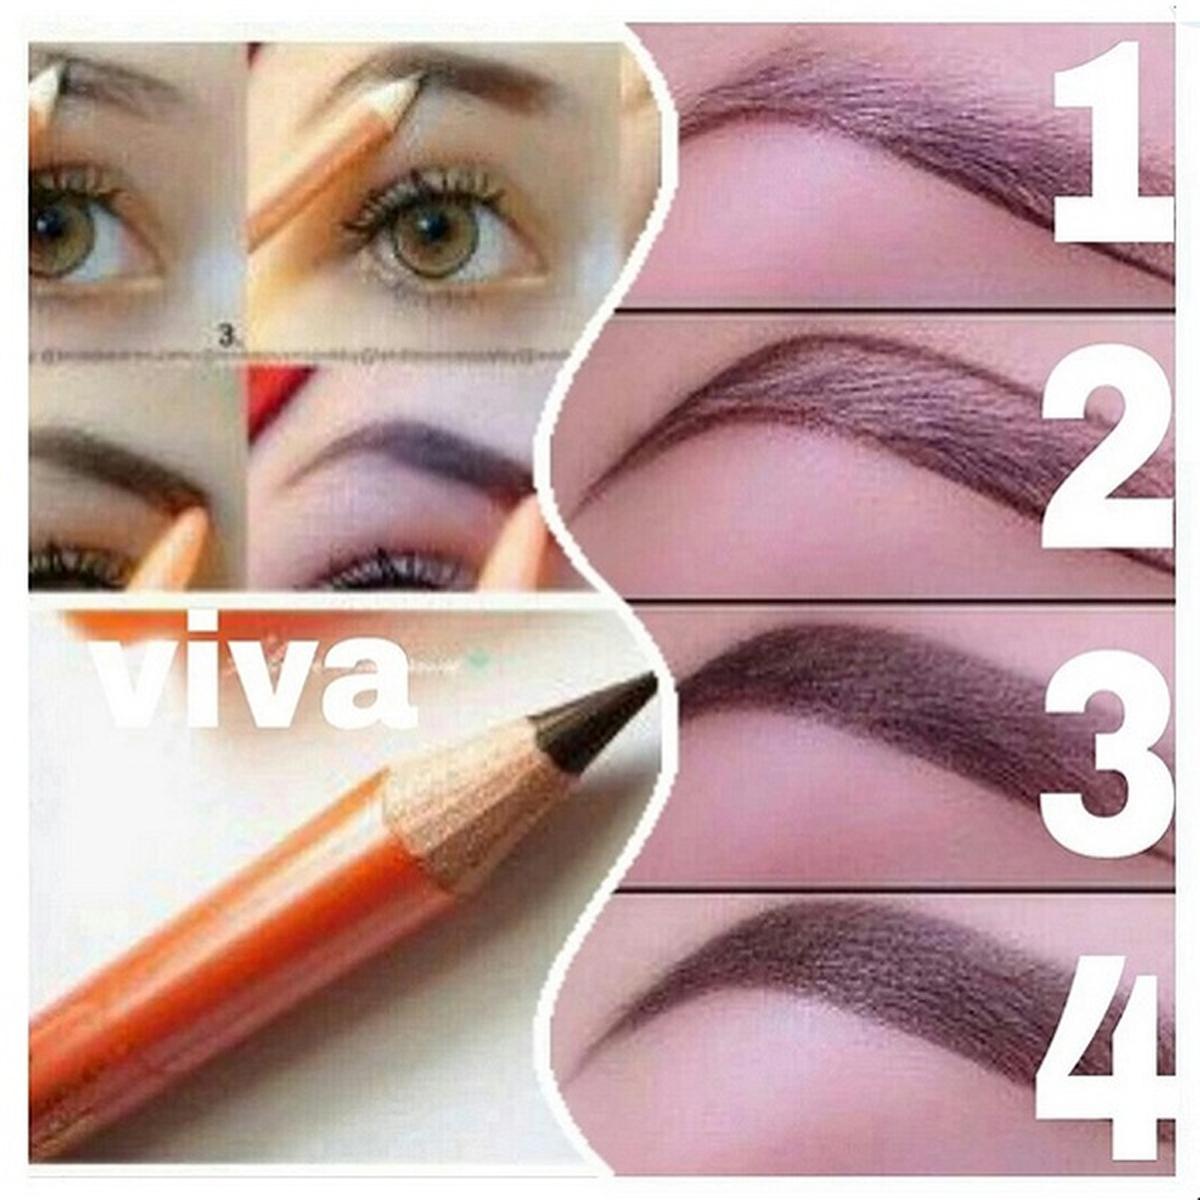 Wardah Eyebrow Pencil Black Membentuk Dan Mewarnai Alis Pesil Eyebrowpensil Viva Pensil Warna Coklat 2 Pcs